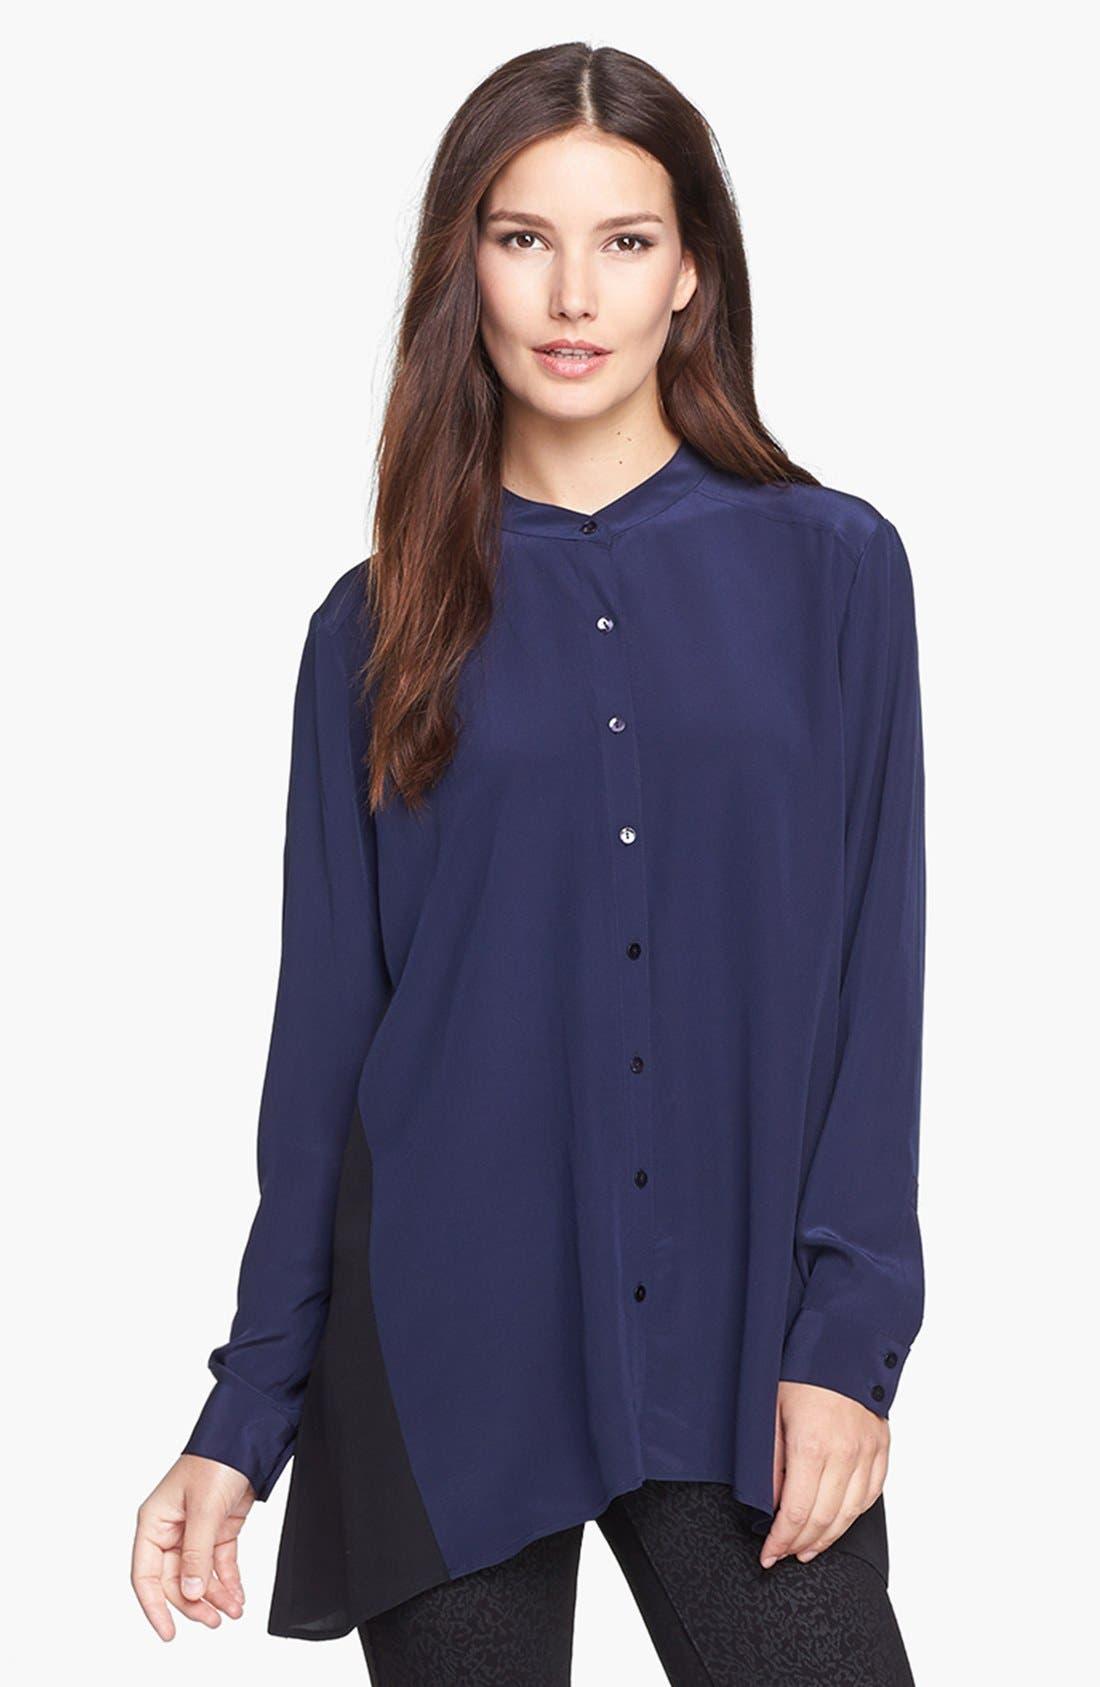 Alternate Image 1 Selected - Eileen Fisher Mandarin Collar Silk Shirt (Online Exclusive)